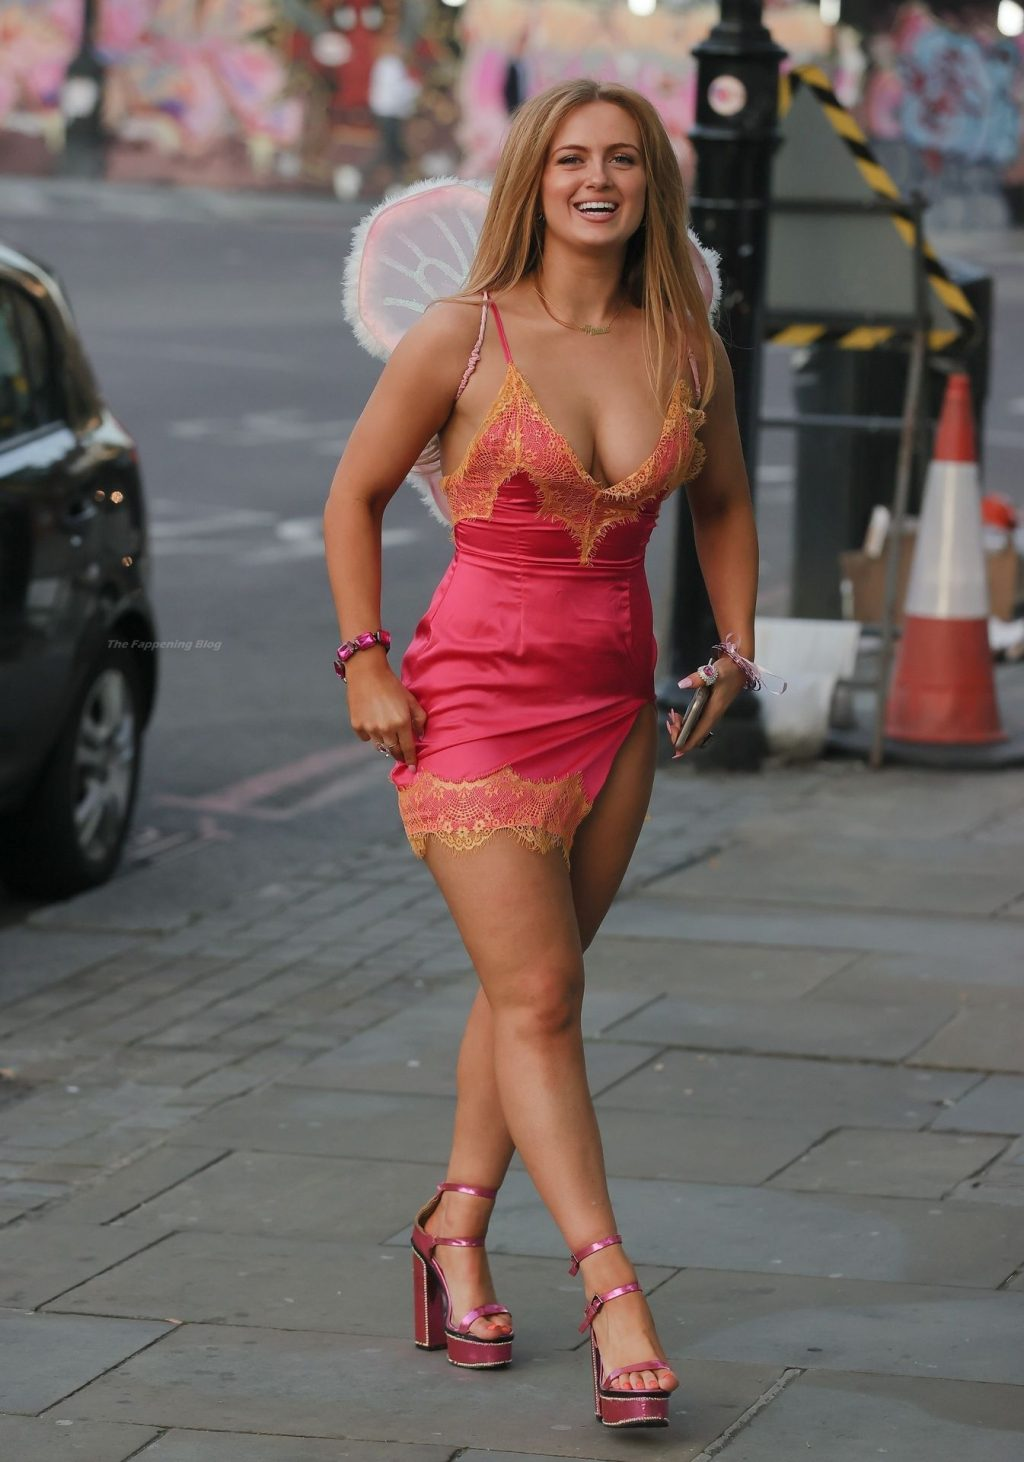 Maisie Smith Celebrates Her Birthday in London (33 Photos)